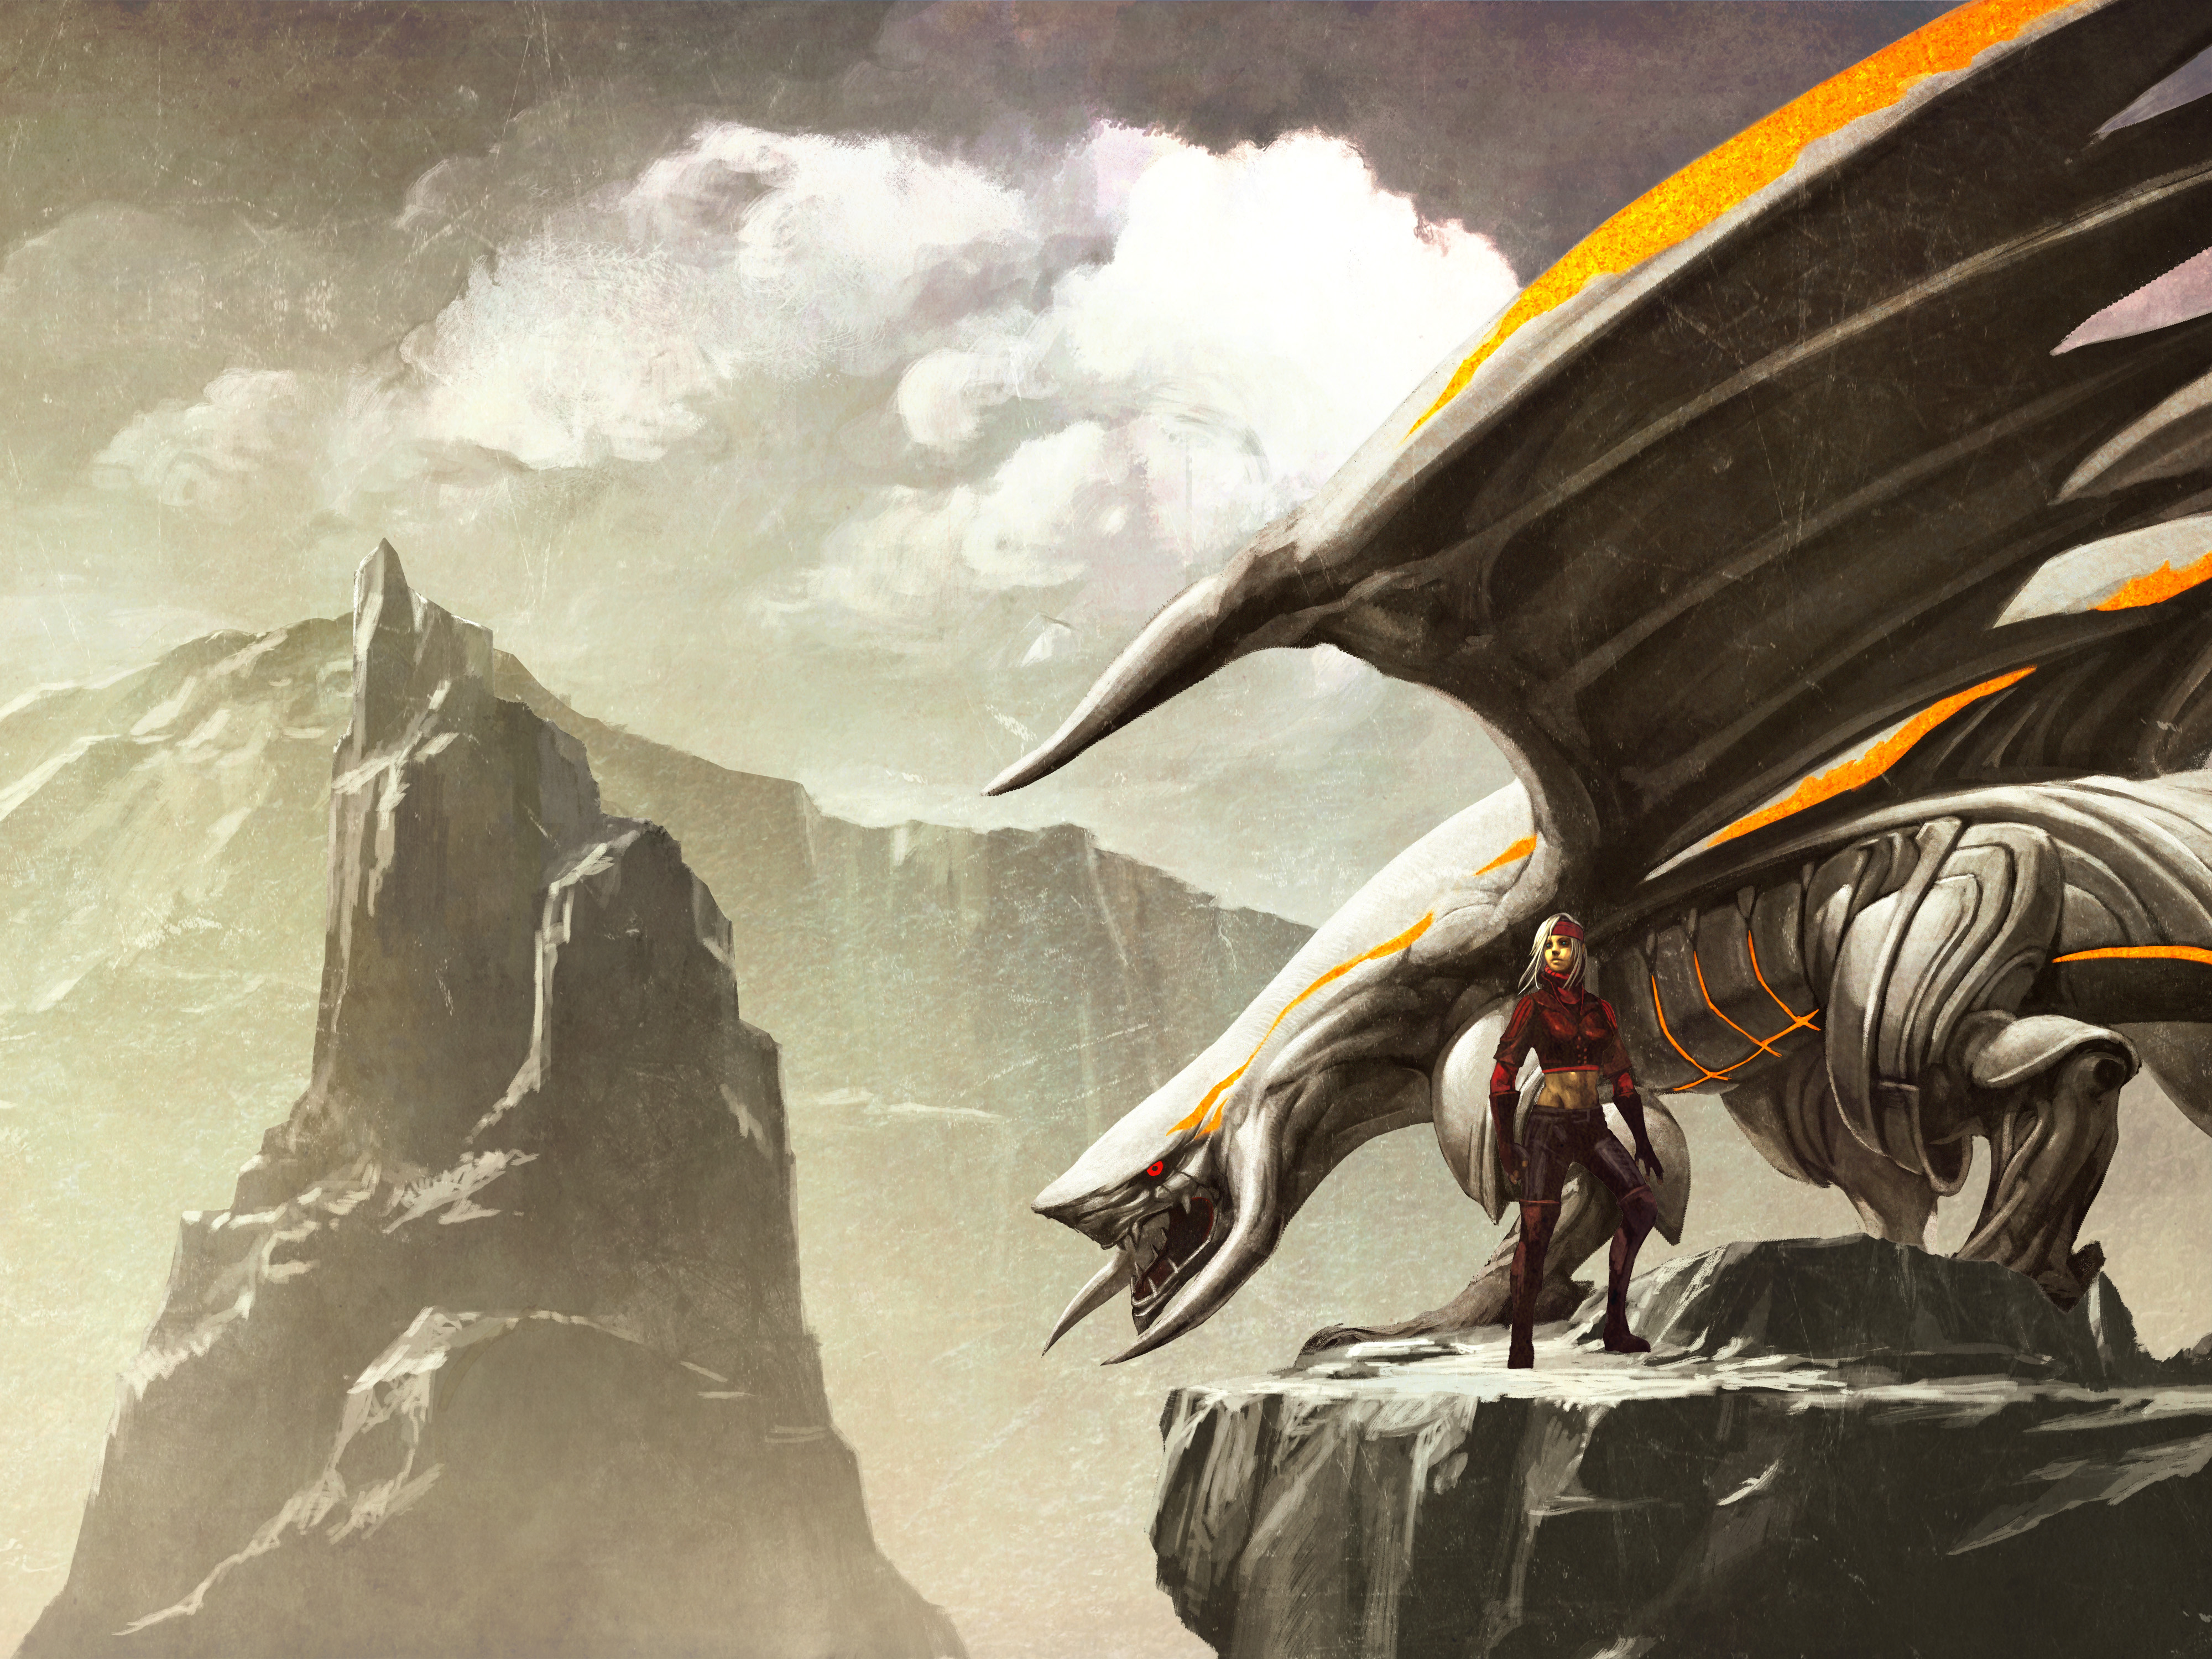 crimson dragon wallpaper - photo #15